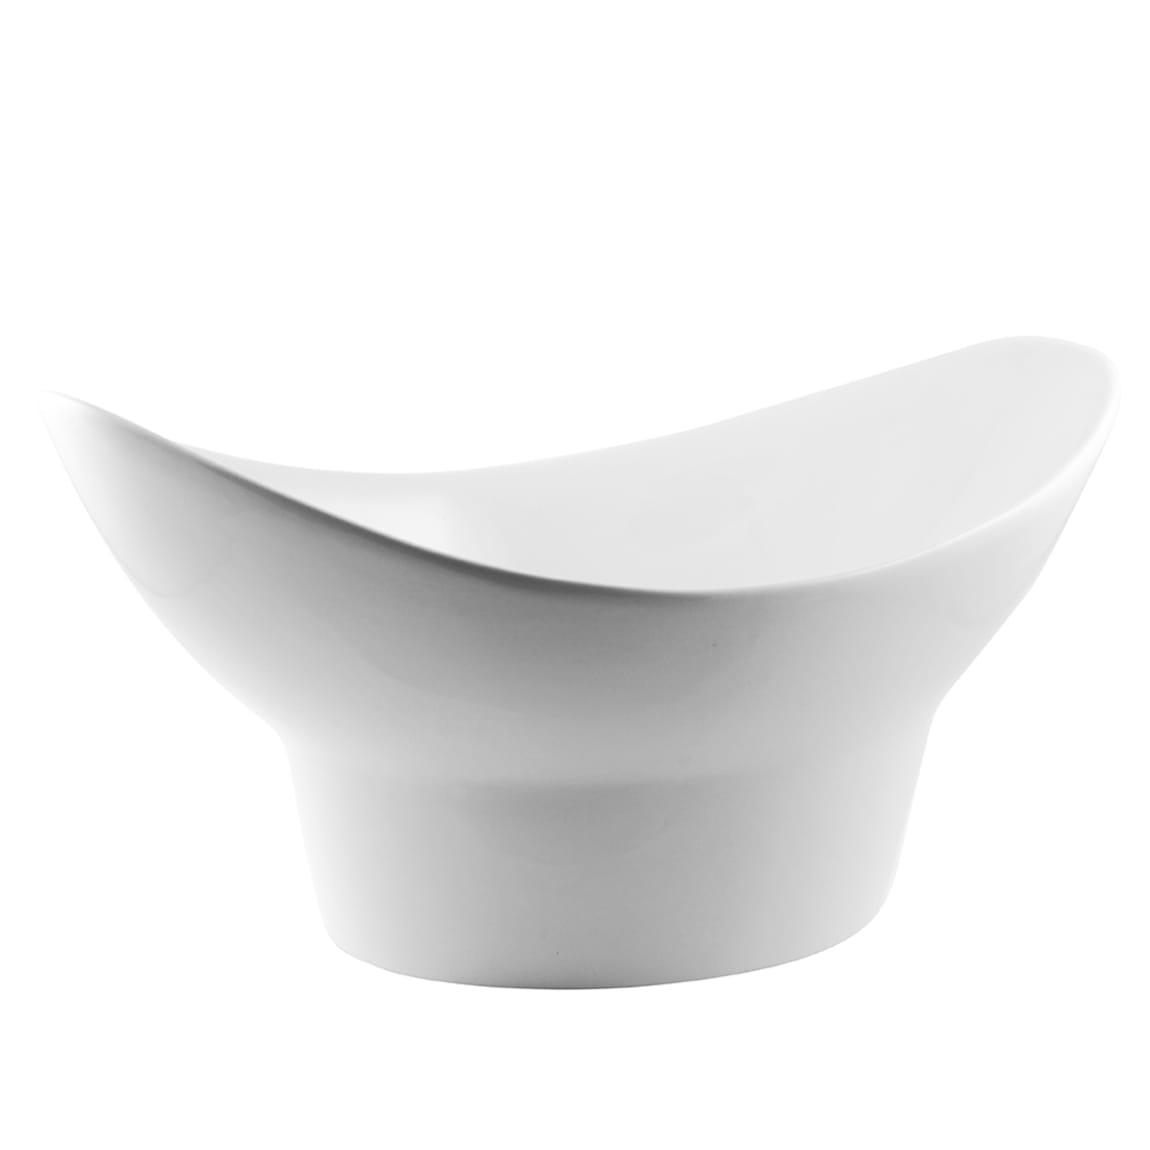 10 Strawberry Street WTR-13FTDOVLBWL 68 oz Oval Bowl -Porcelain, White